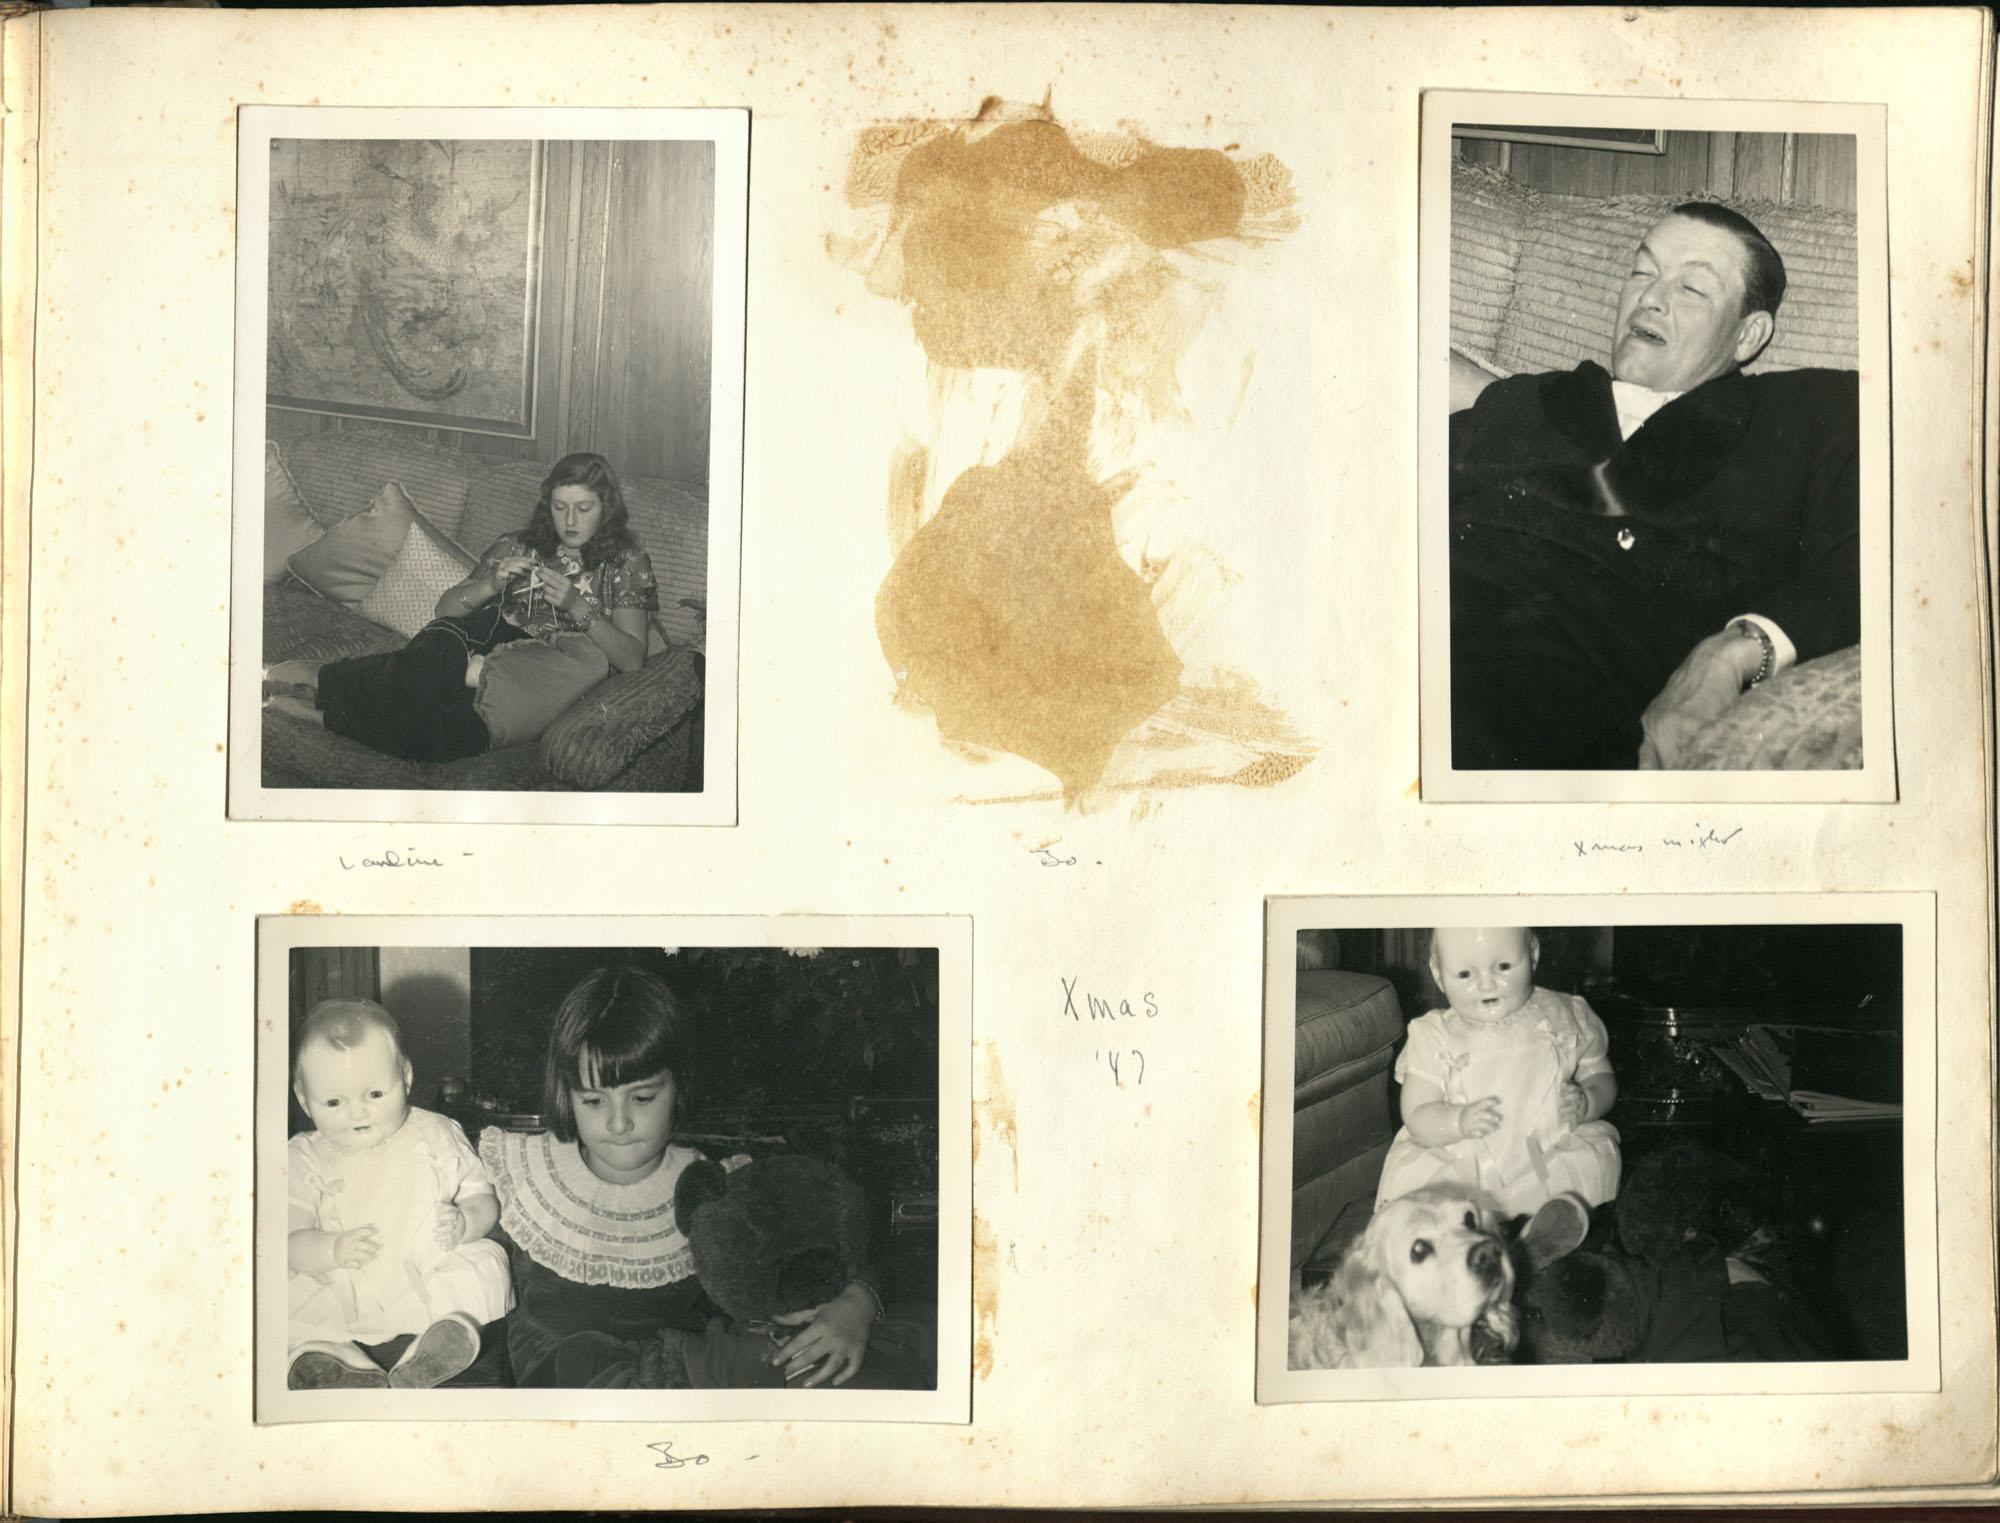 Medway Plantation Photograph Album, 1949, page 125